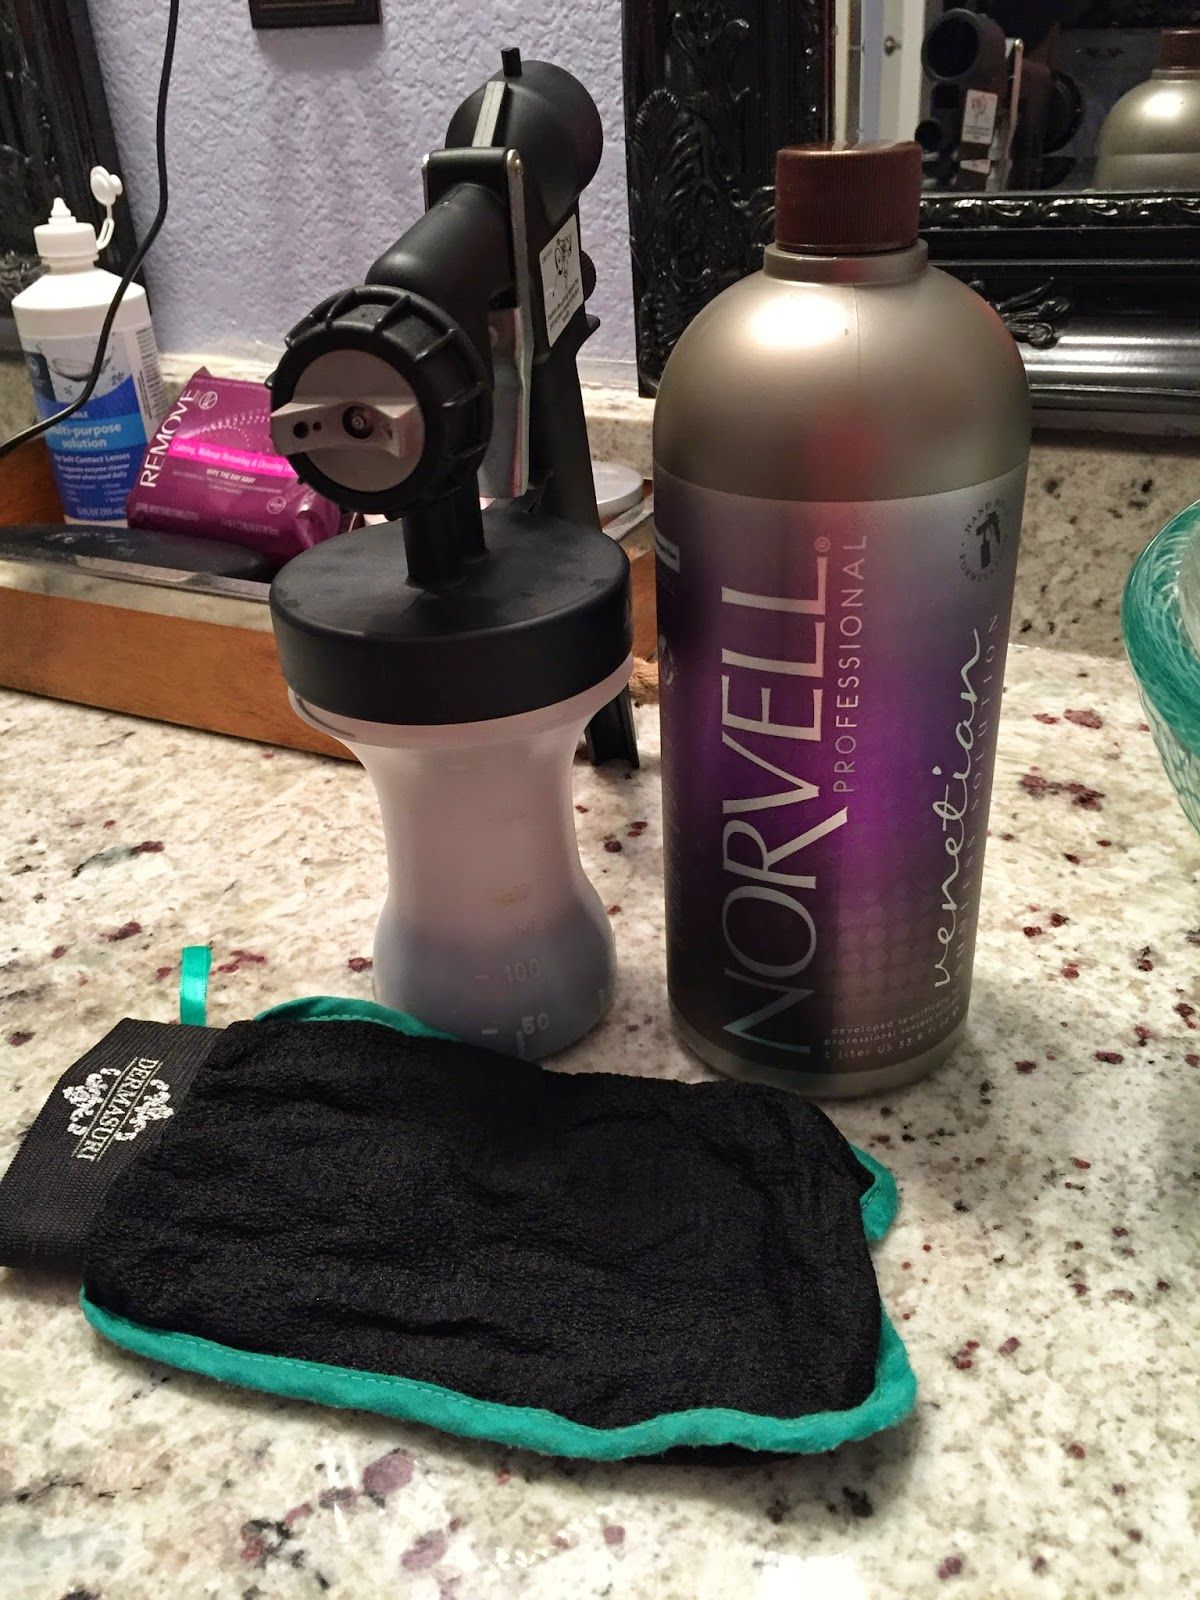 Spray Tan Machine Favorites New and Old. | Spray tan ...